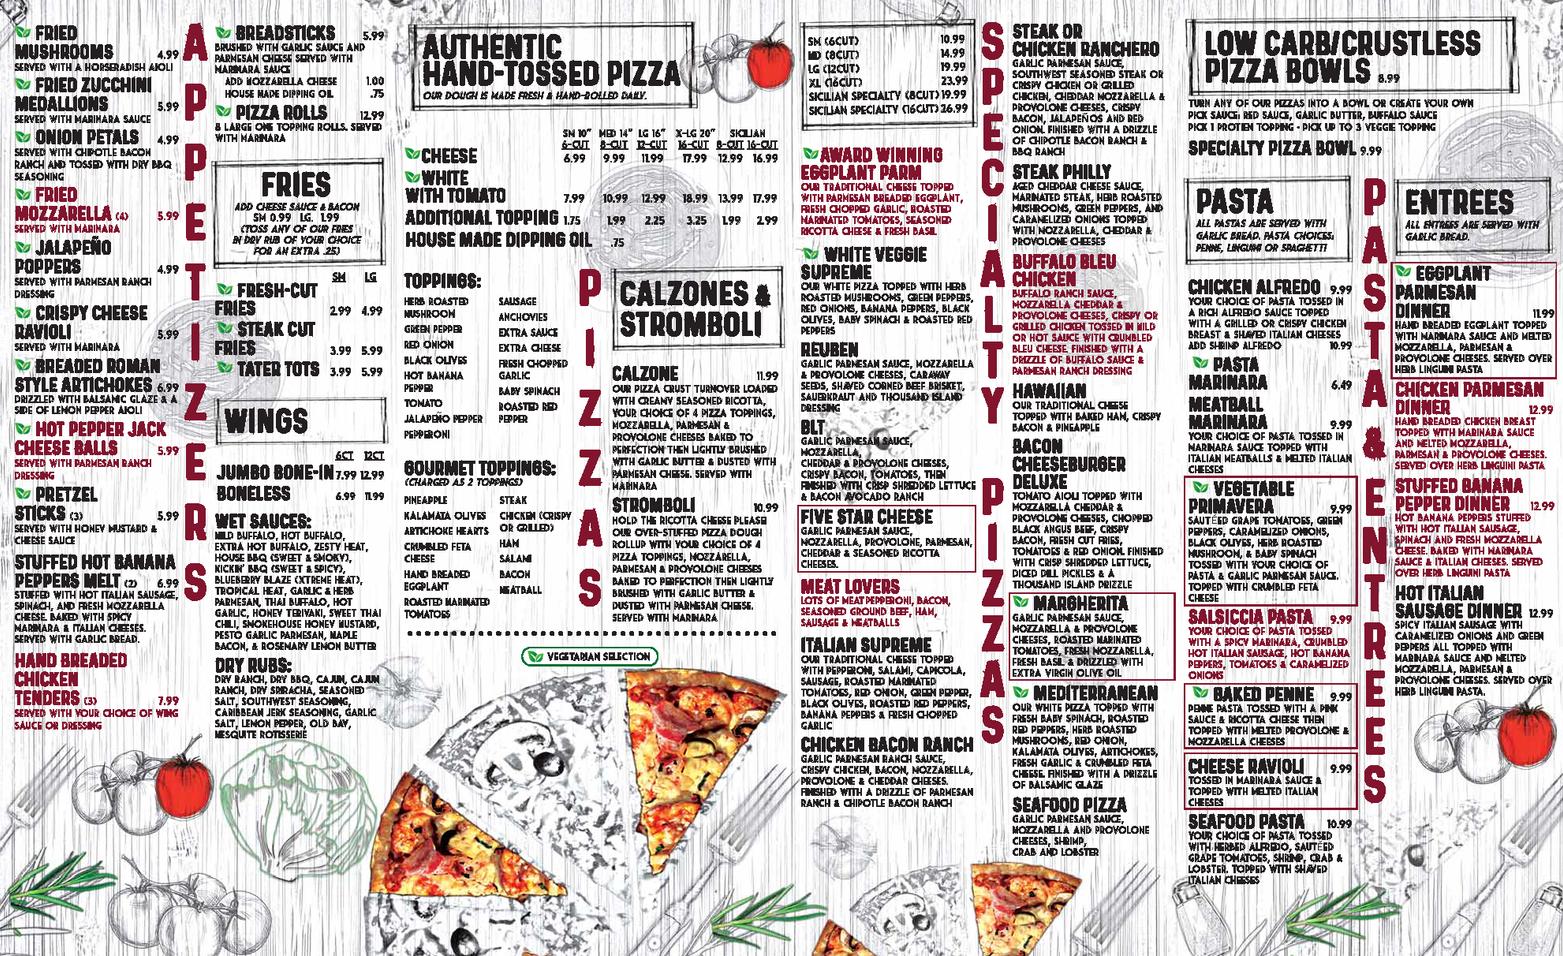 DeMorePizza_Feb2020_Web_Page_2.png